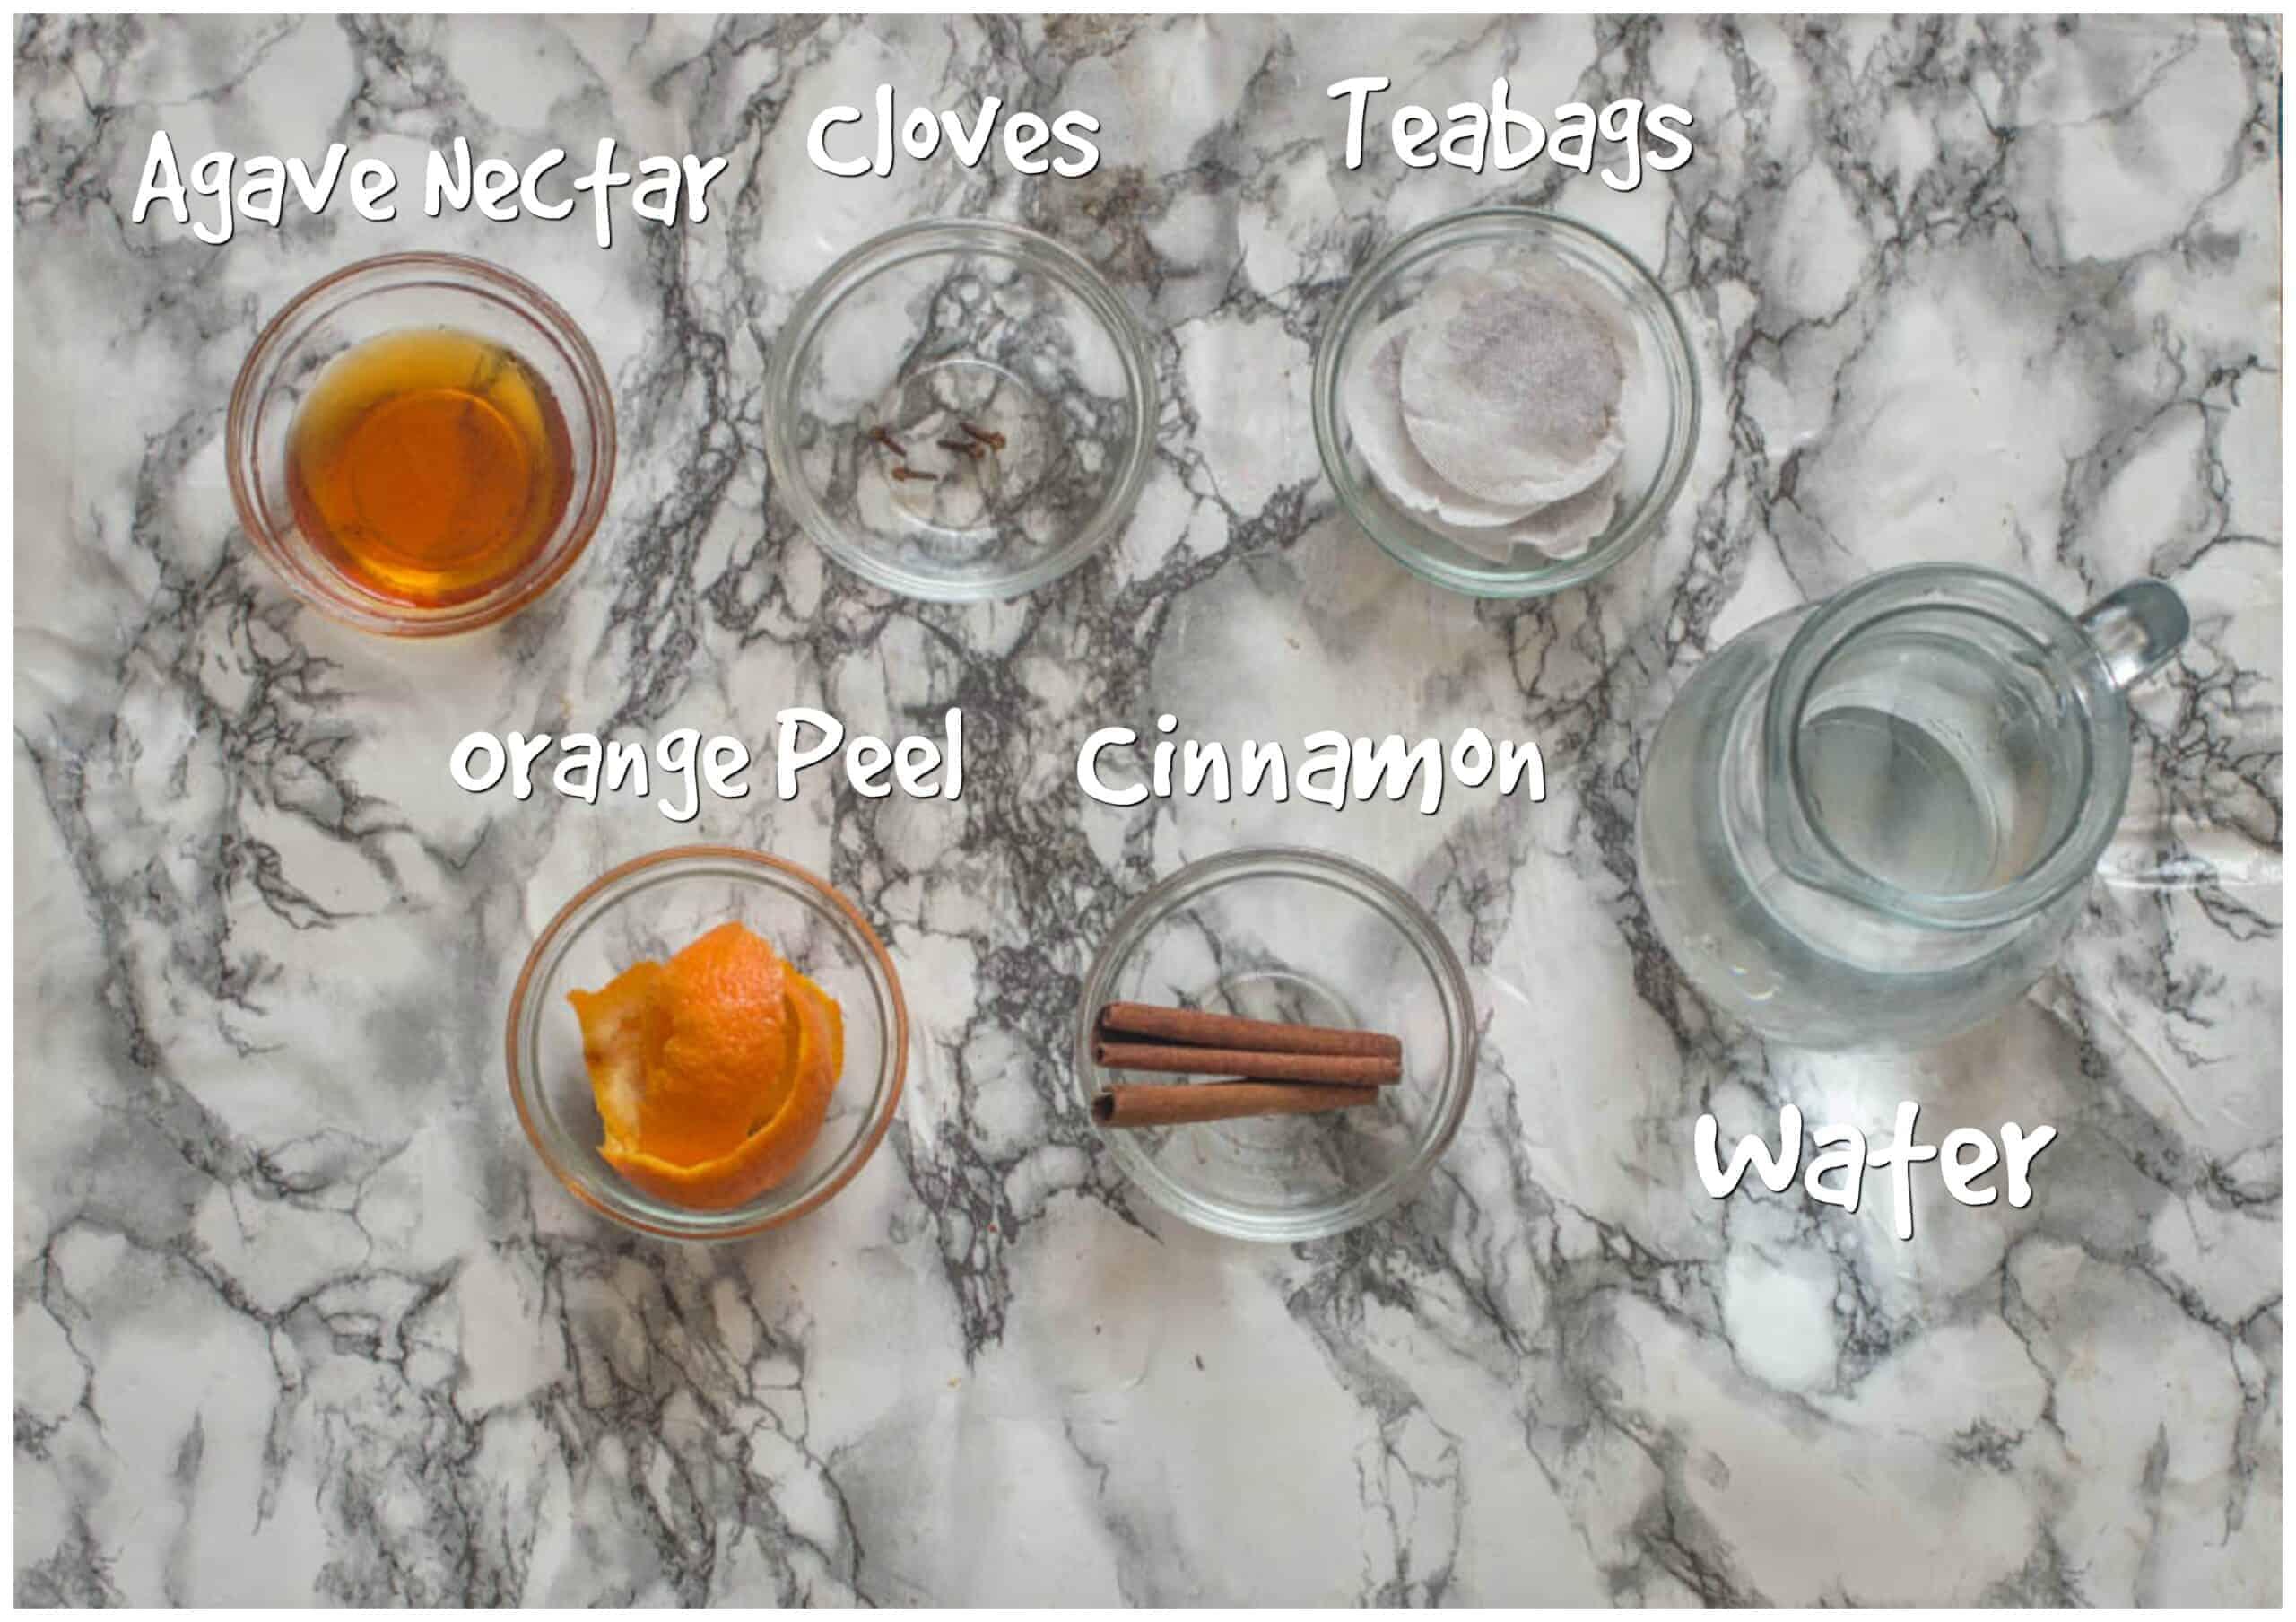 ingredients for cinnamon orange cold brew tea